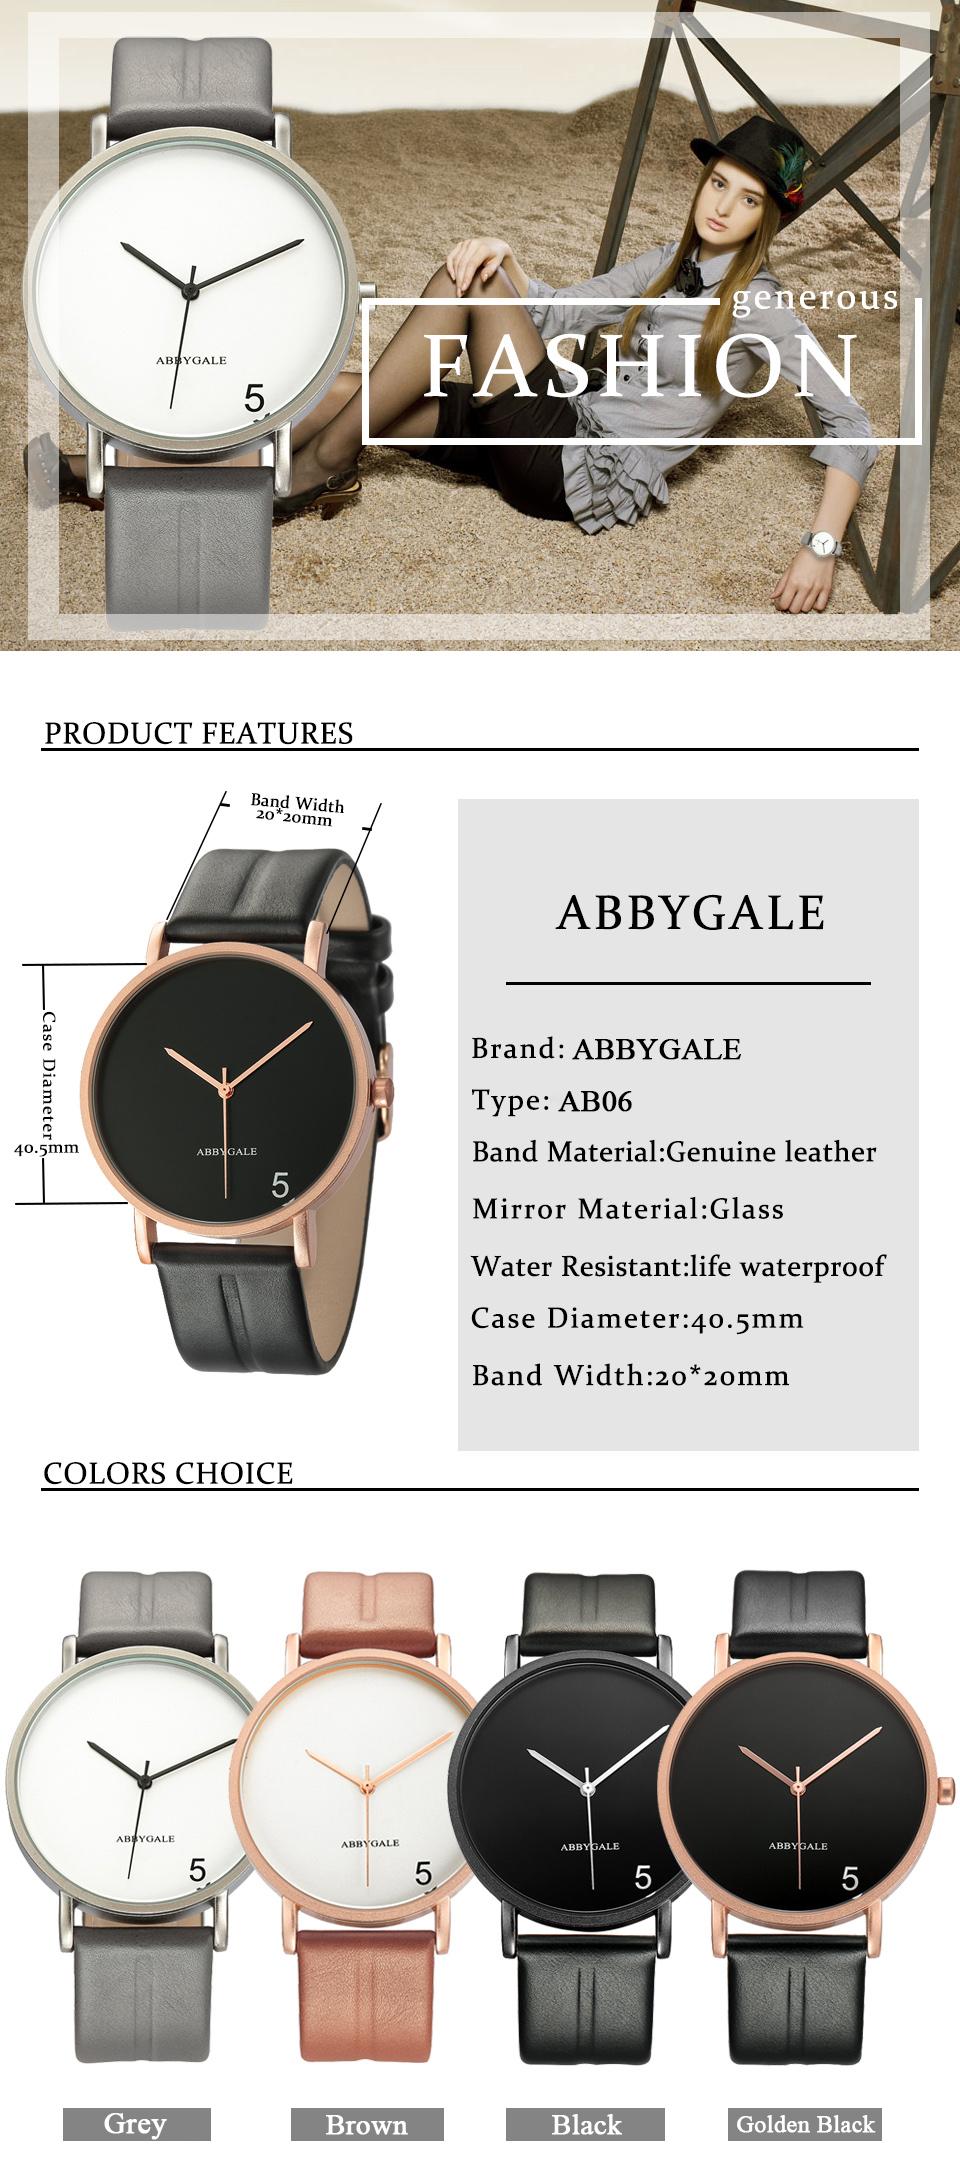 Único de las mujeres reloj de moda cuadrado minimalista reloj de pulsera de  cuero mujer Reloj Simple de cuarzo reloj femenino WhatchUSD 4.99 piece a1089324f9e0